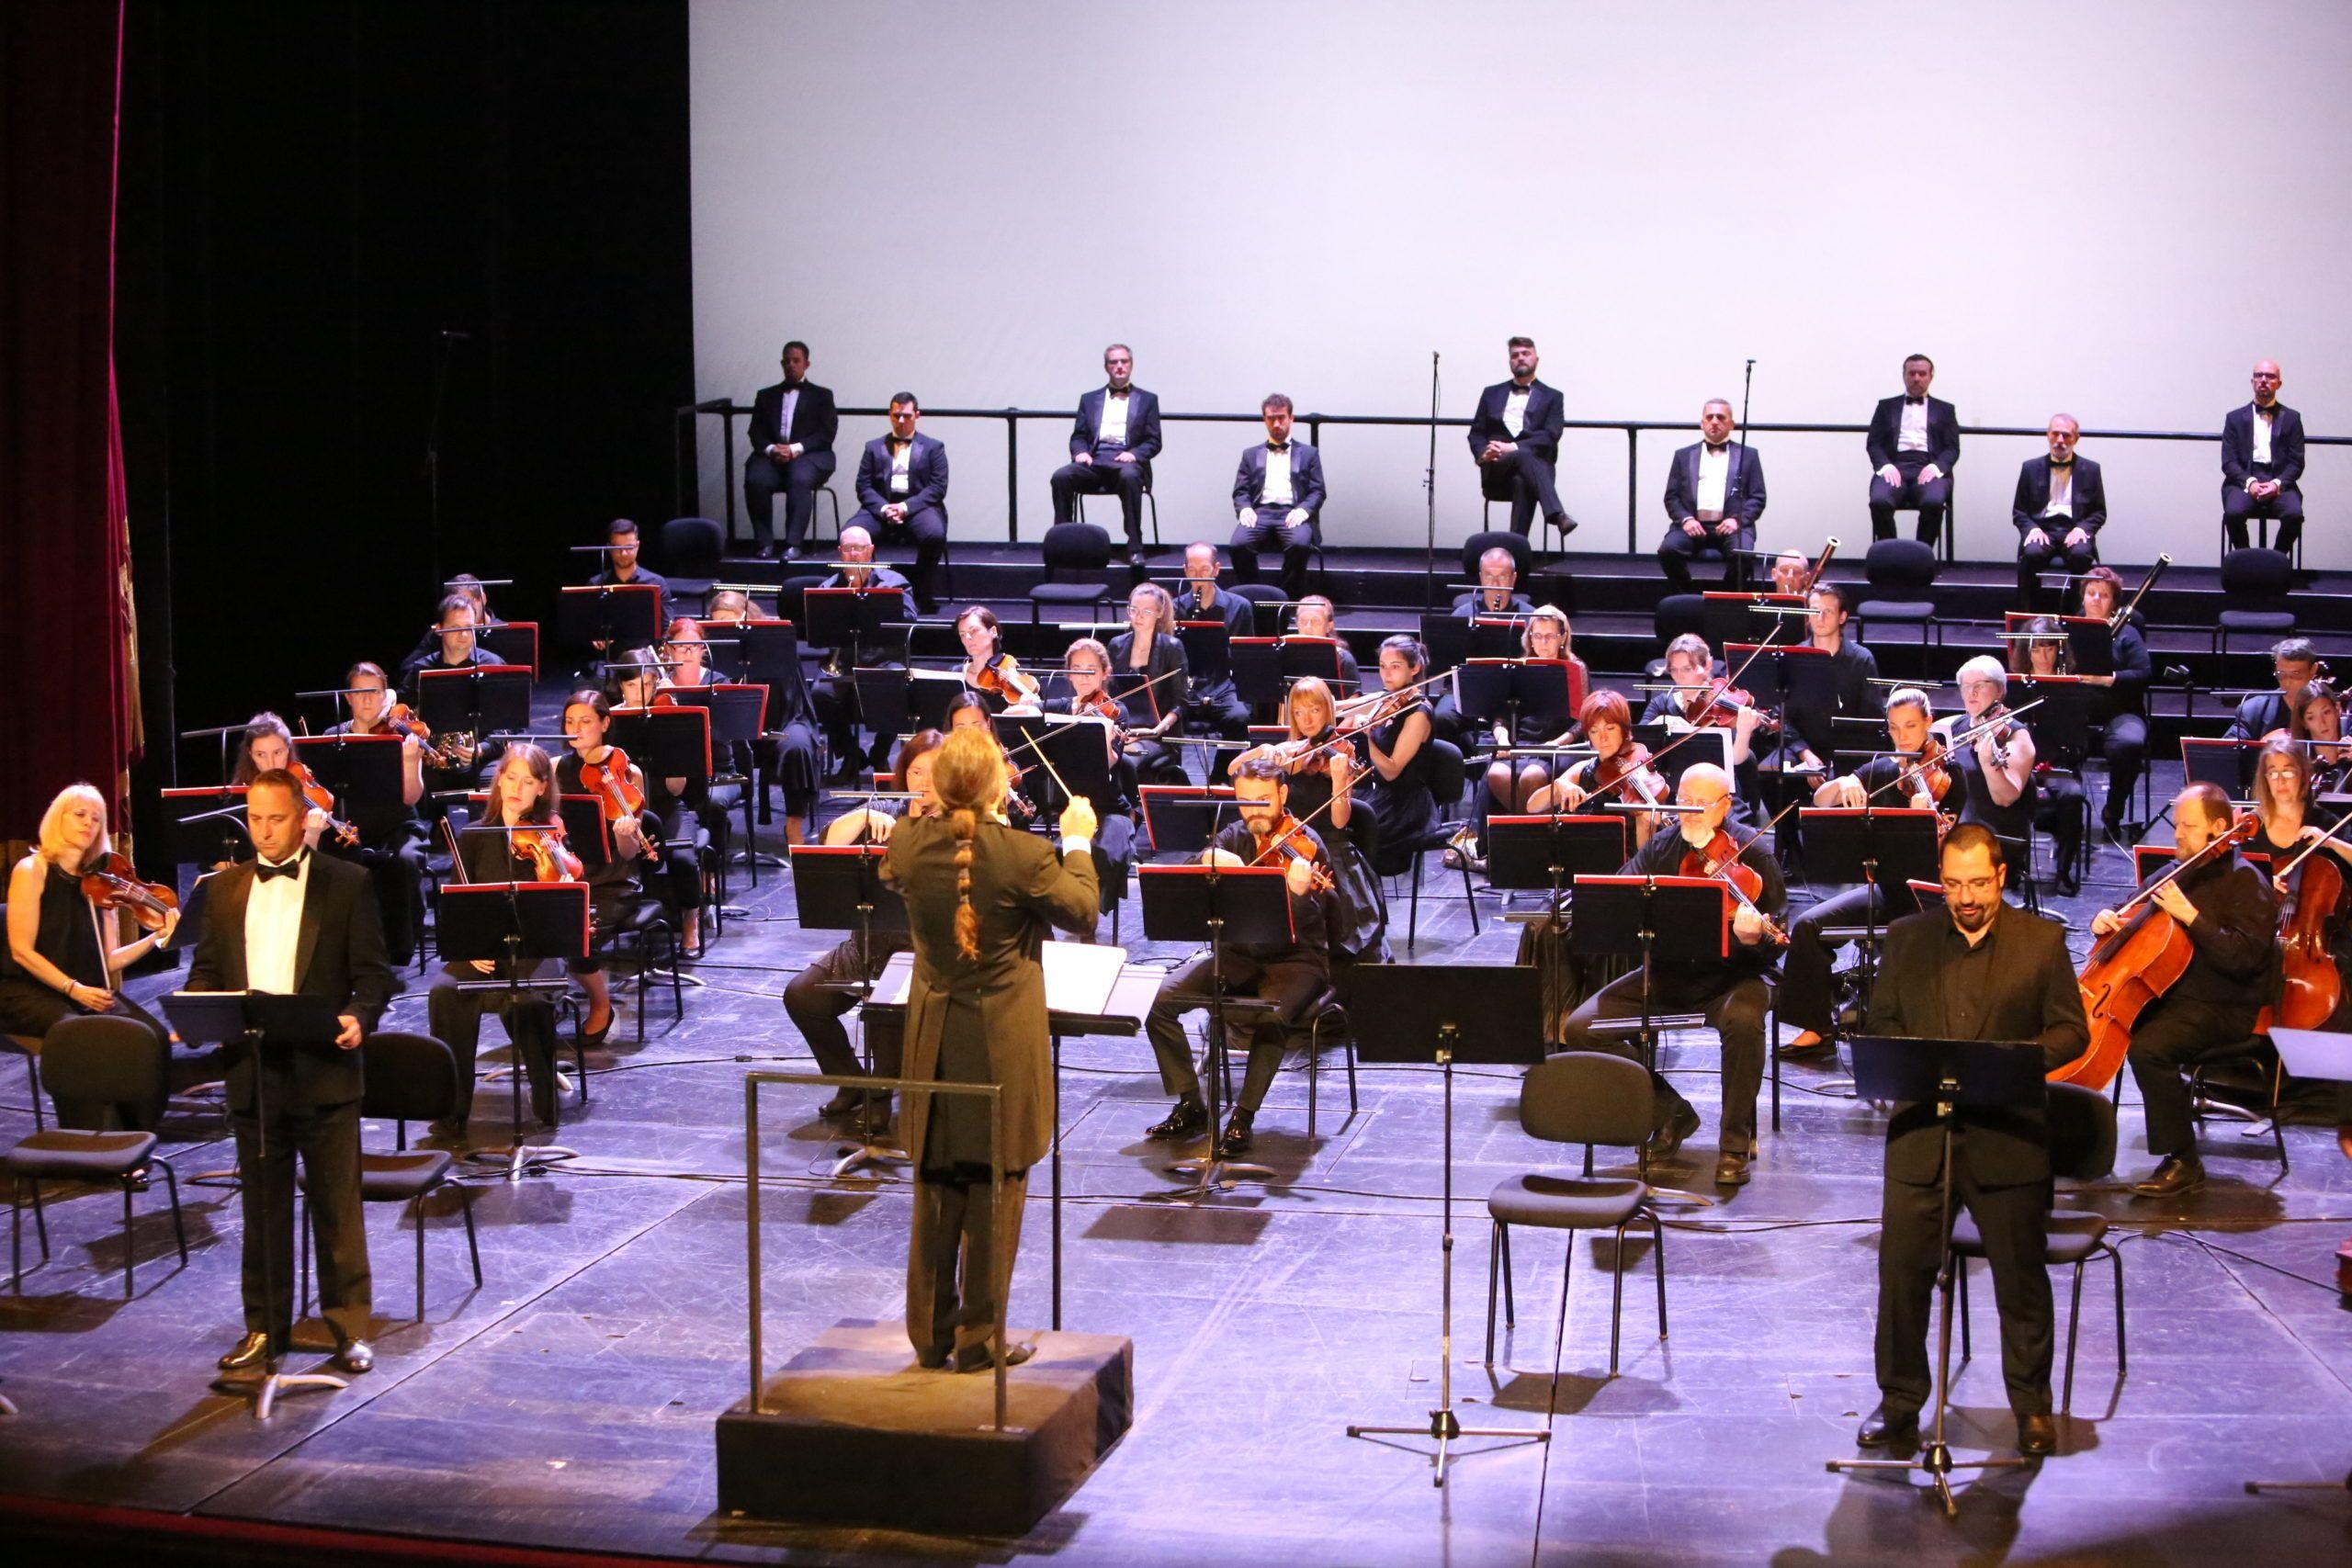 Opera Lucia di Lammermoor jedna je od prvih europskih koncertnih izvedbi nakon korona krize